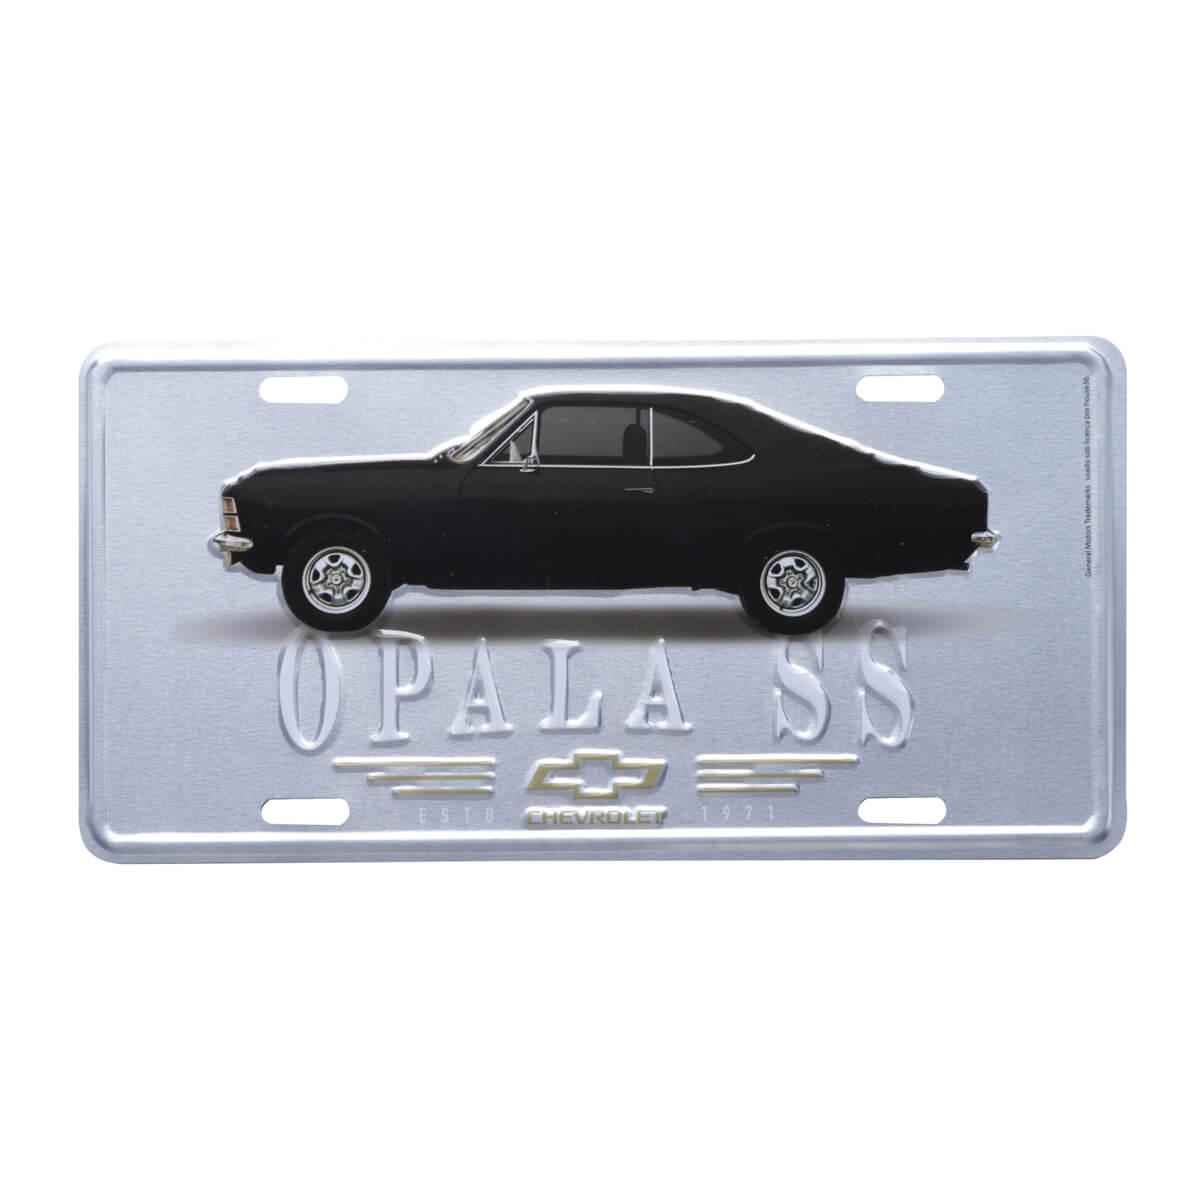 Placa de Alumínio Chevrolet - Opala 1971 - Prata / Preto